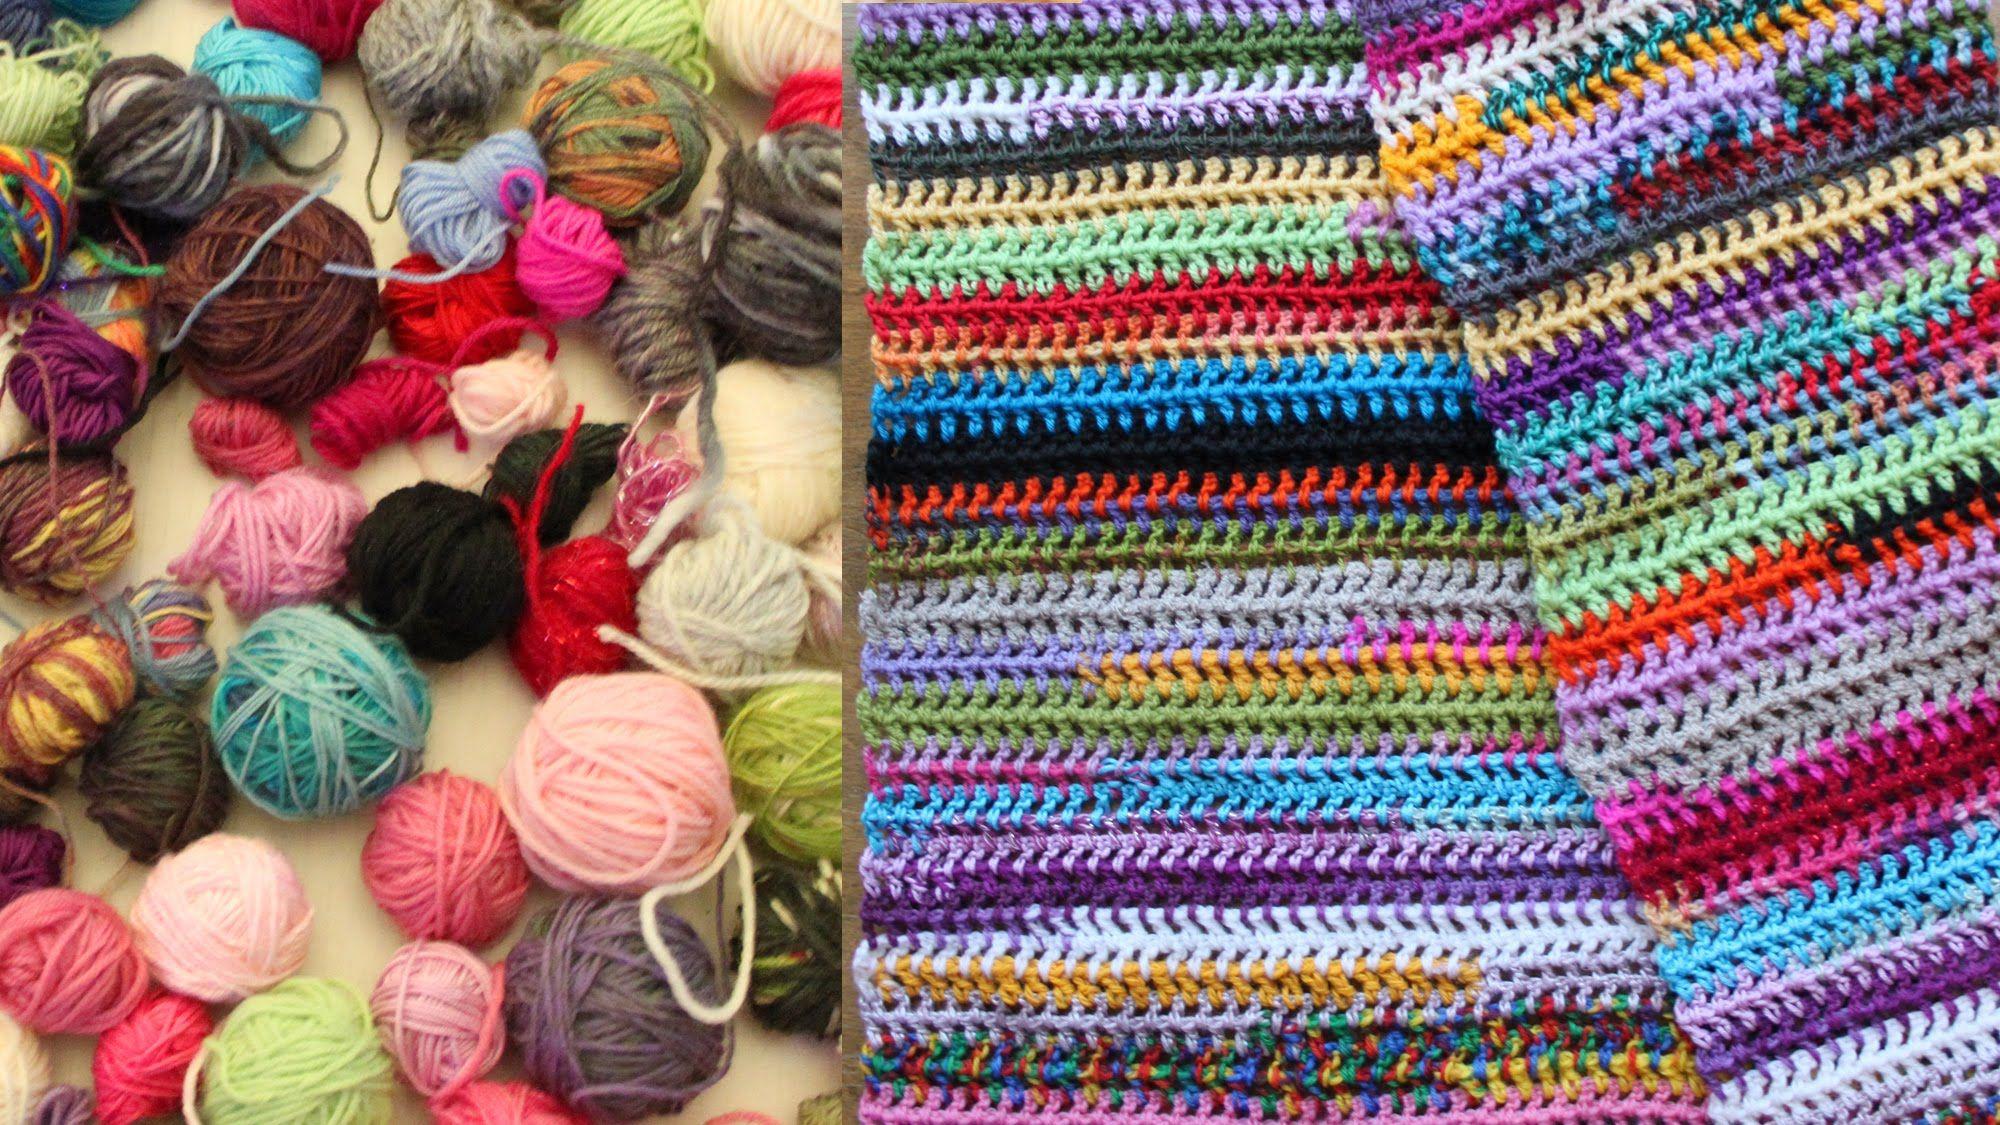 Easy scrap yarn scarf or blanket, crochet tutorial | Crochet and ...